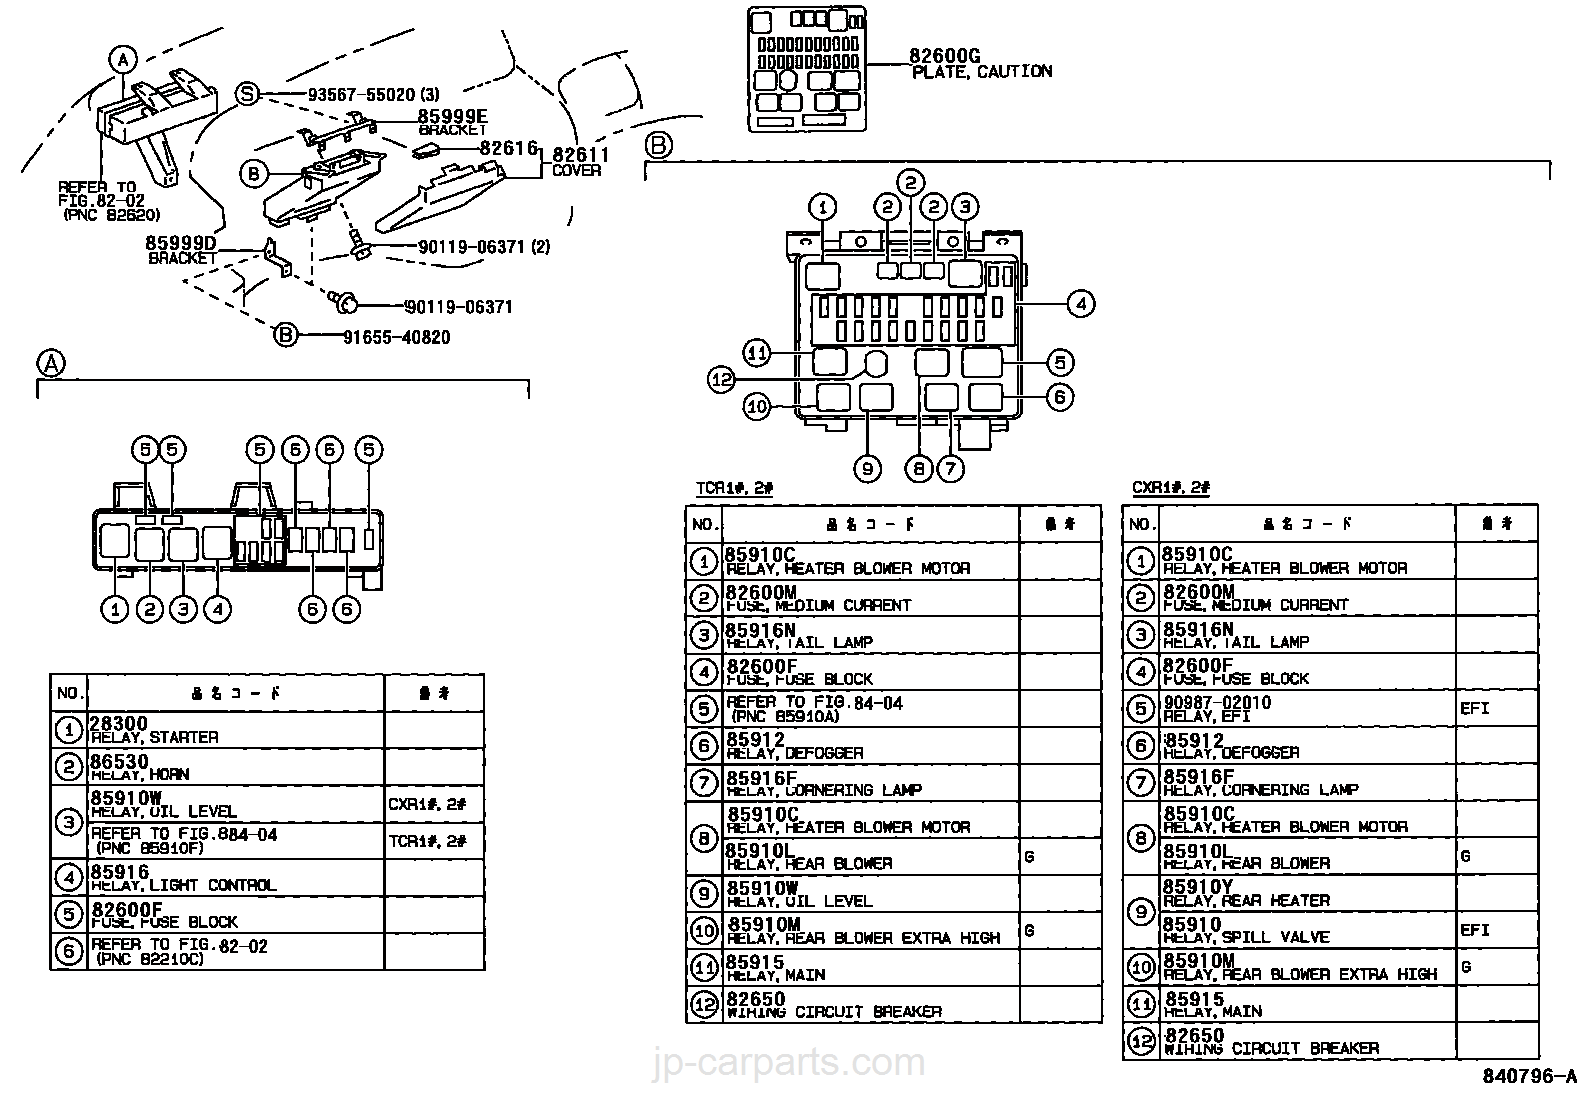 hight resolution of switch u0026 relay u0026 computer toyota part list jp carparts com 2008 avalon